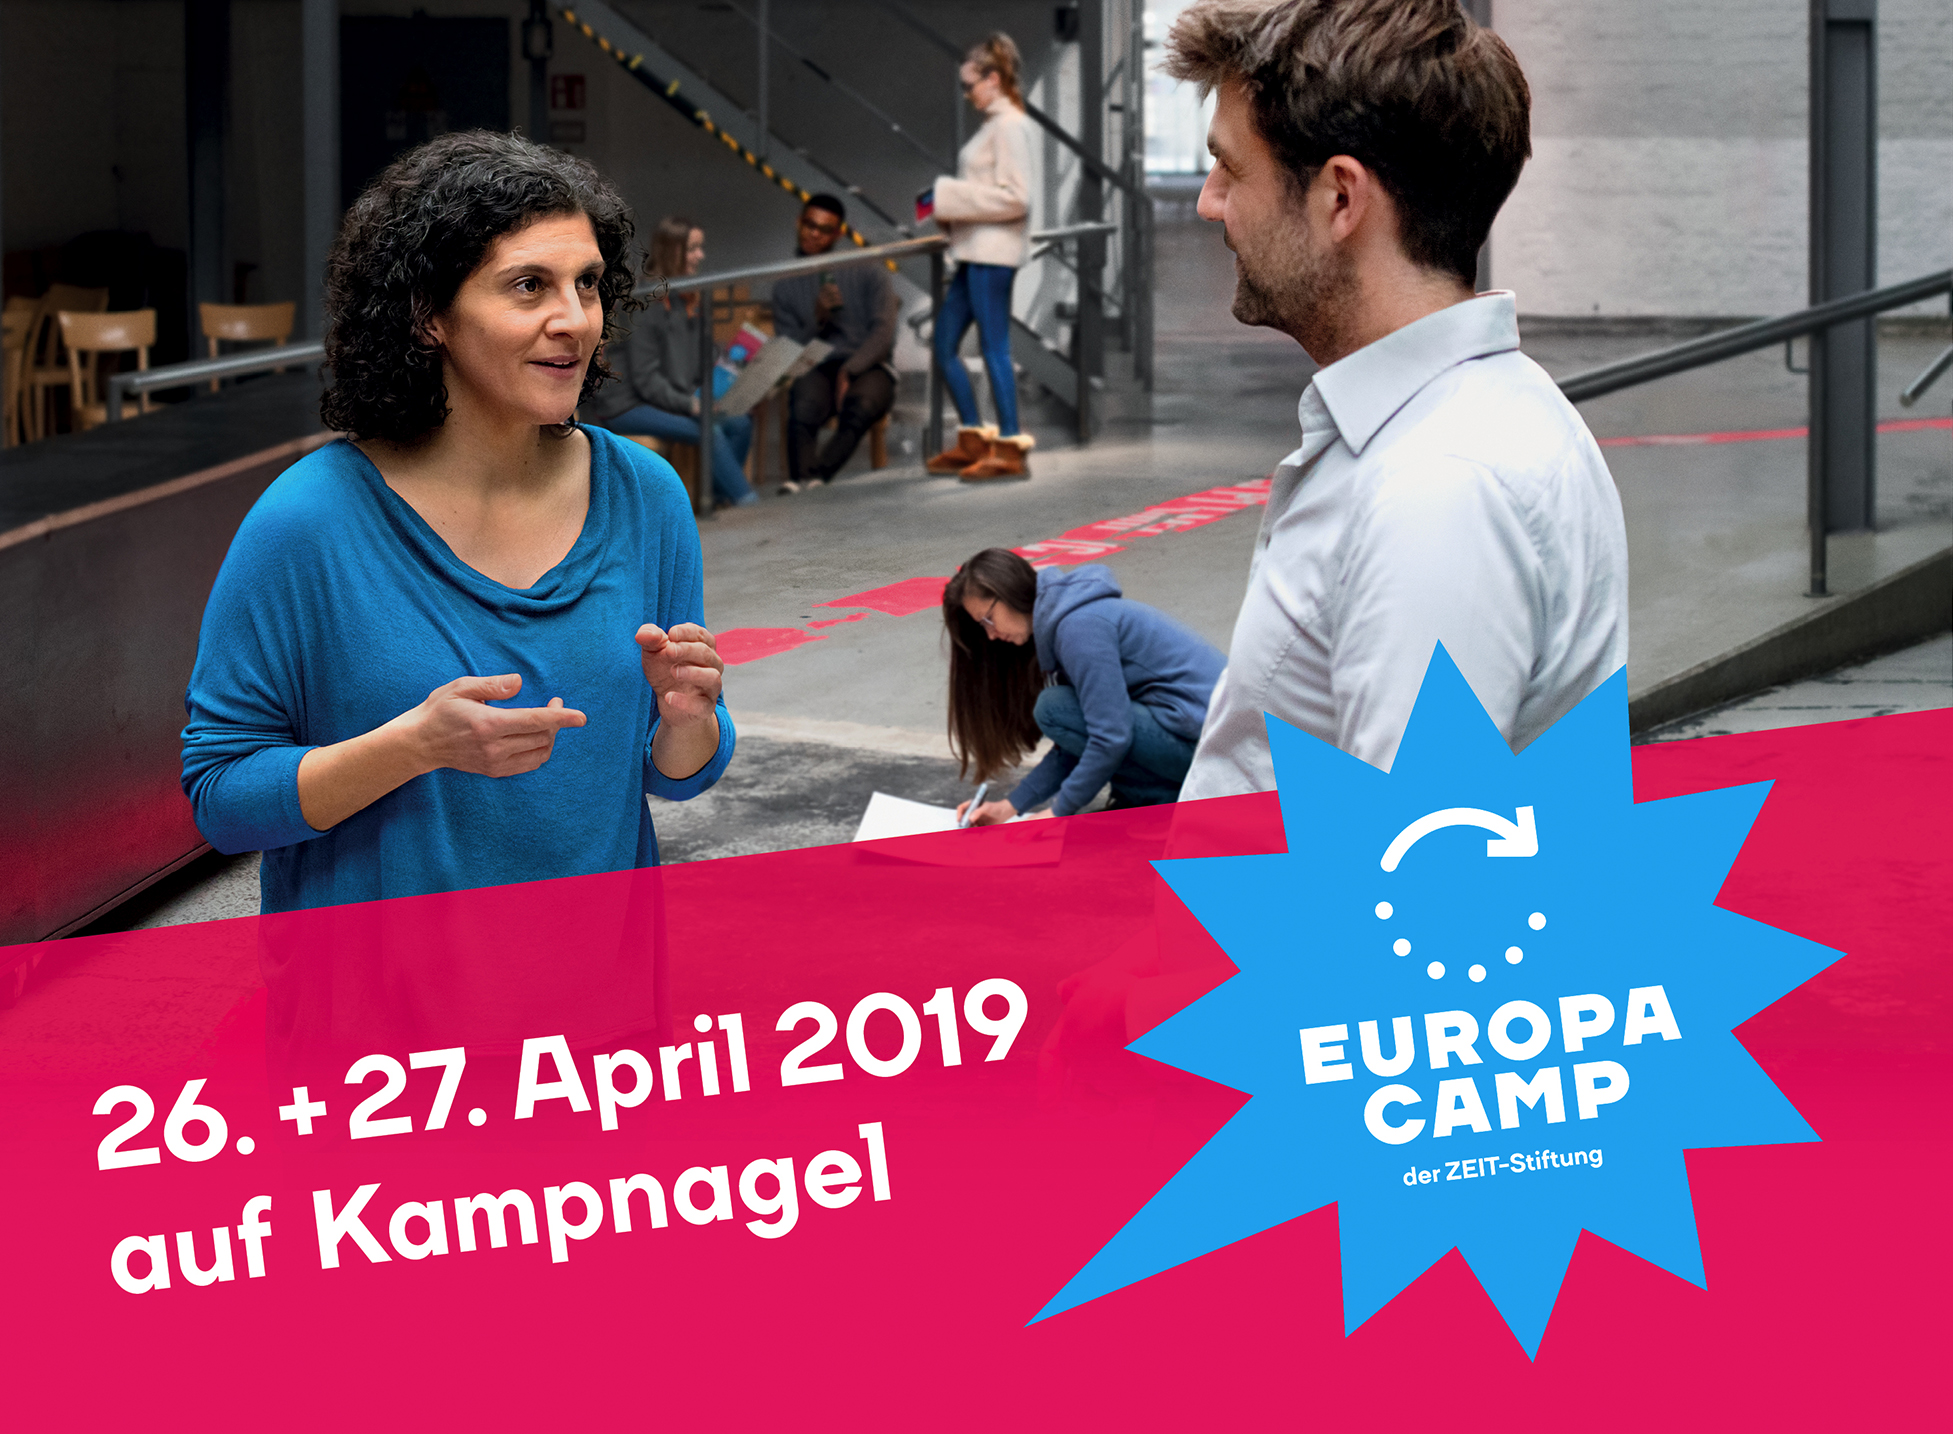 ZEIT-Stiftung EuropaCamp